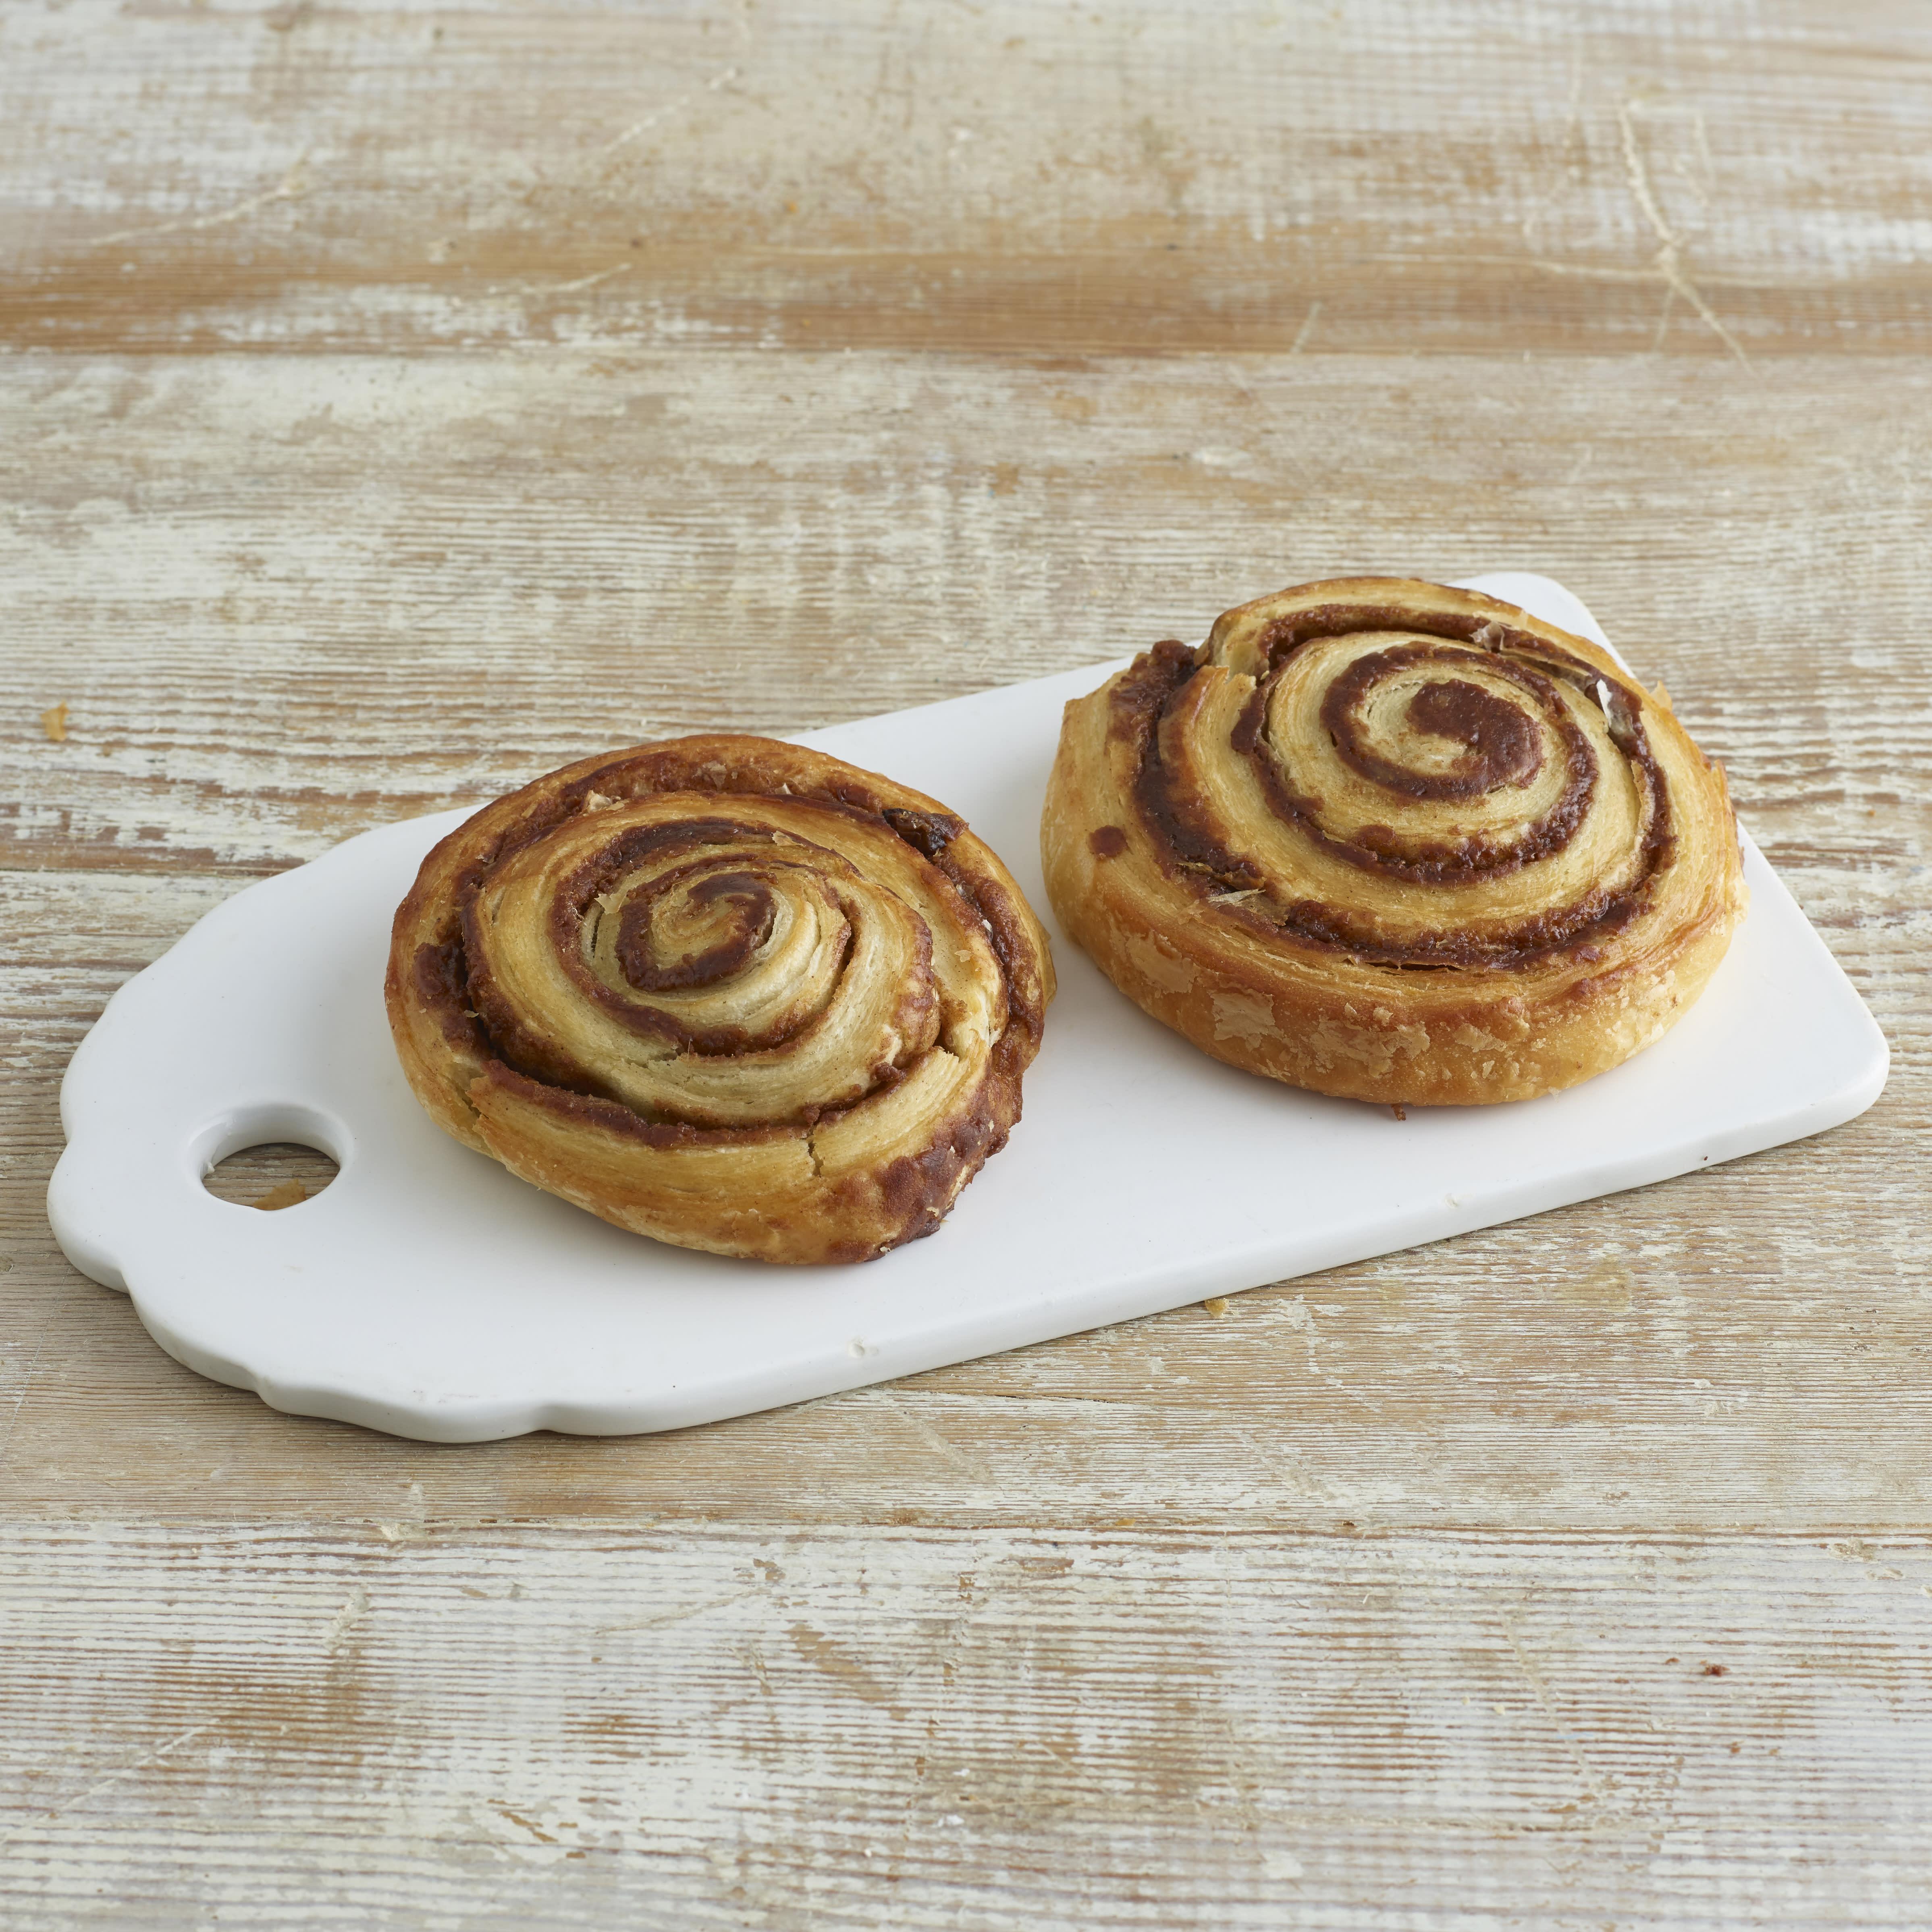 Artisan Bakery Cinnamon Roll, 2 x 60g